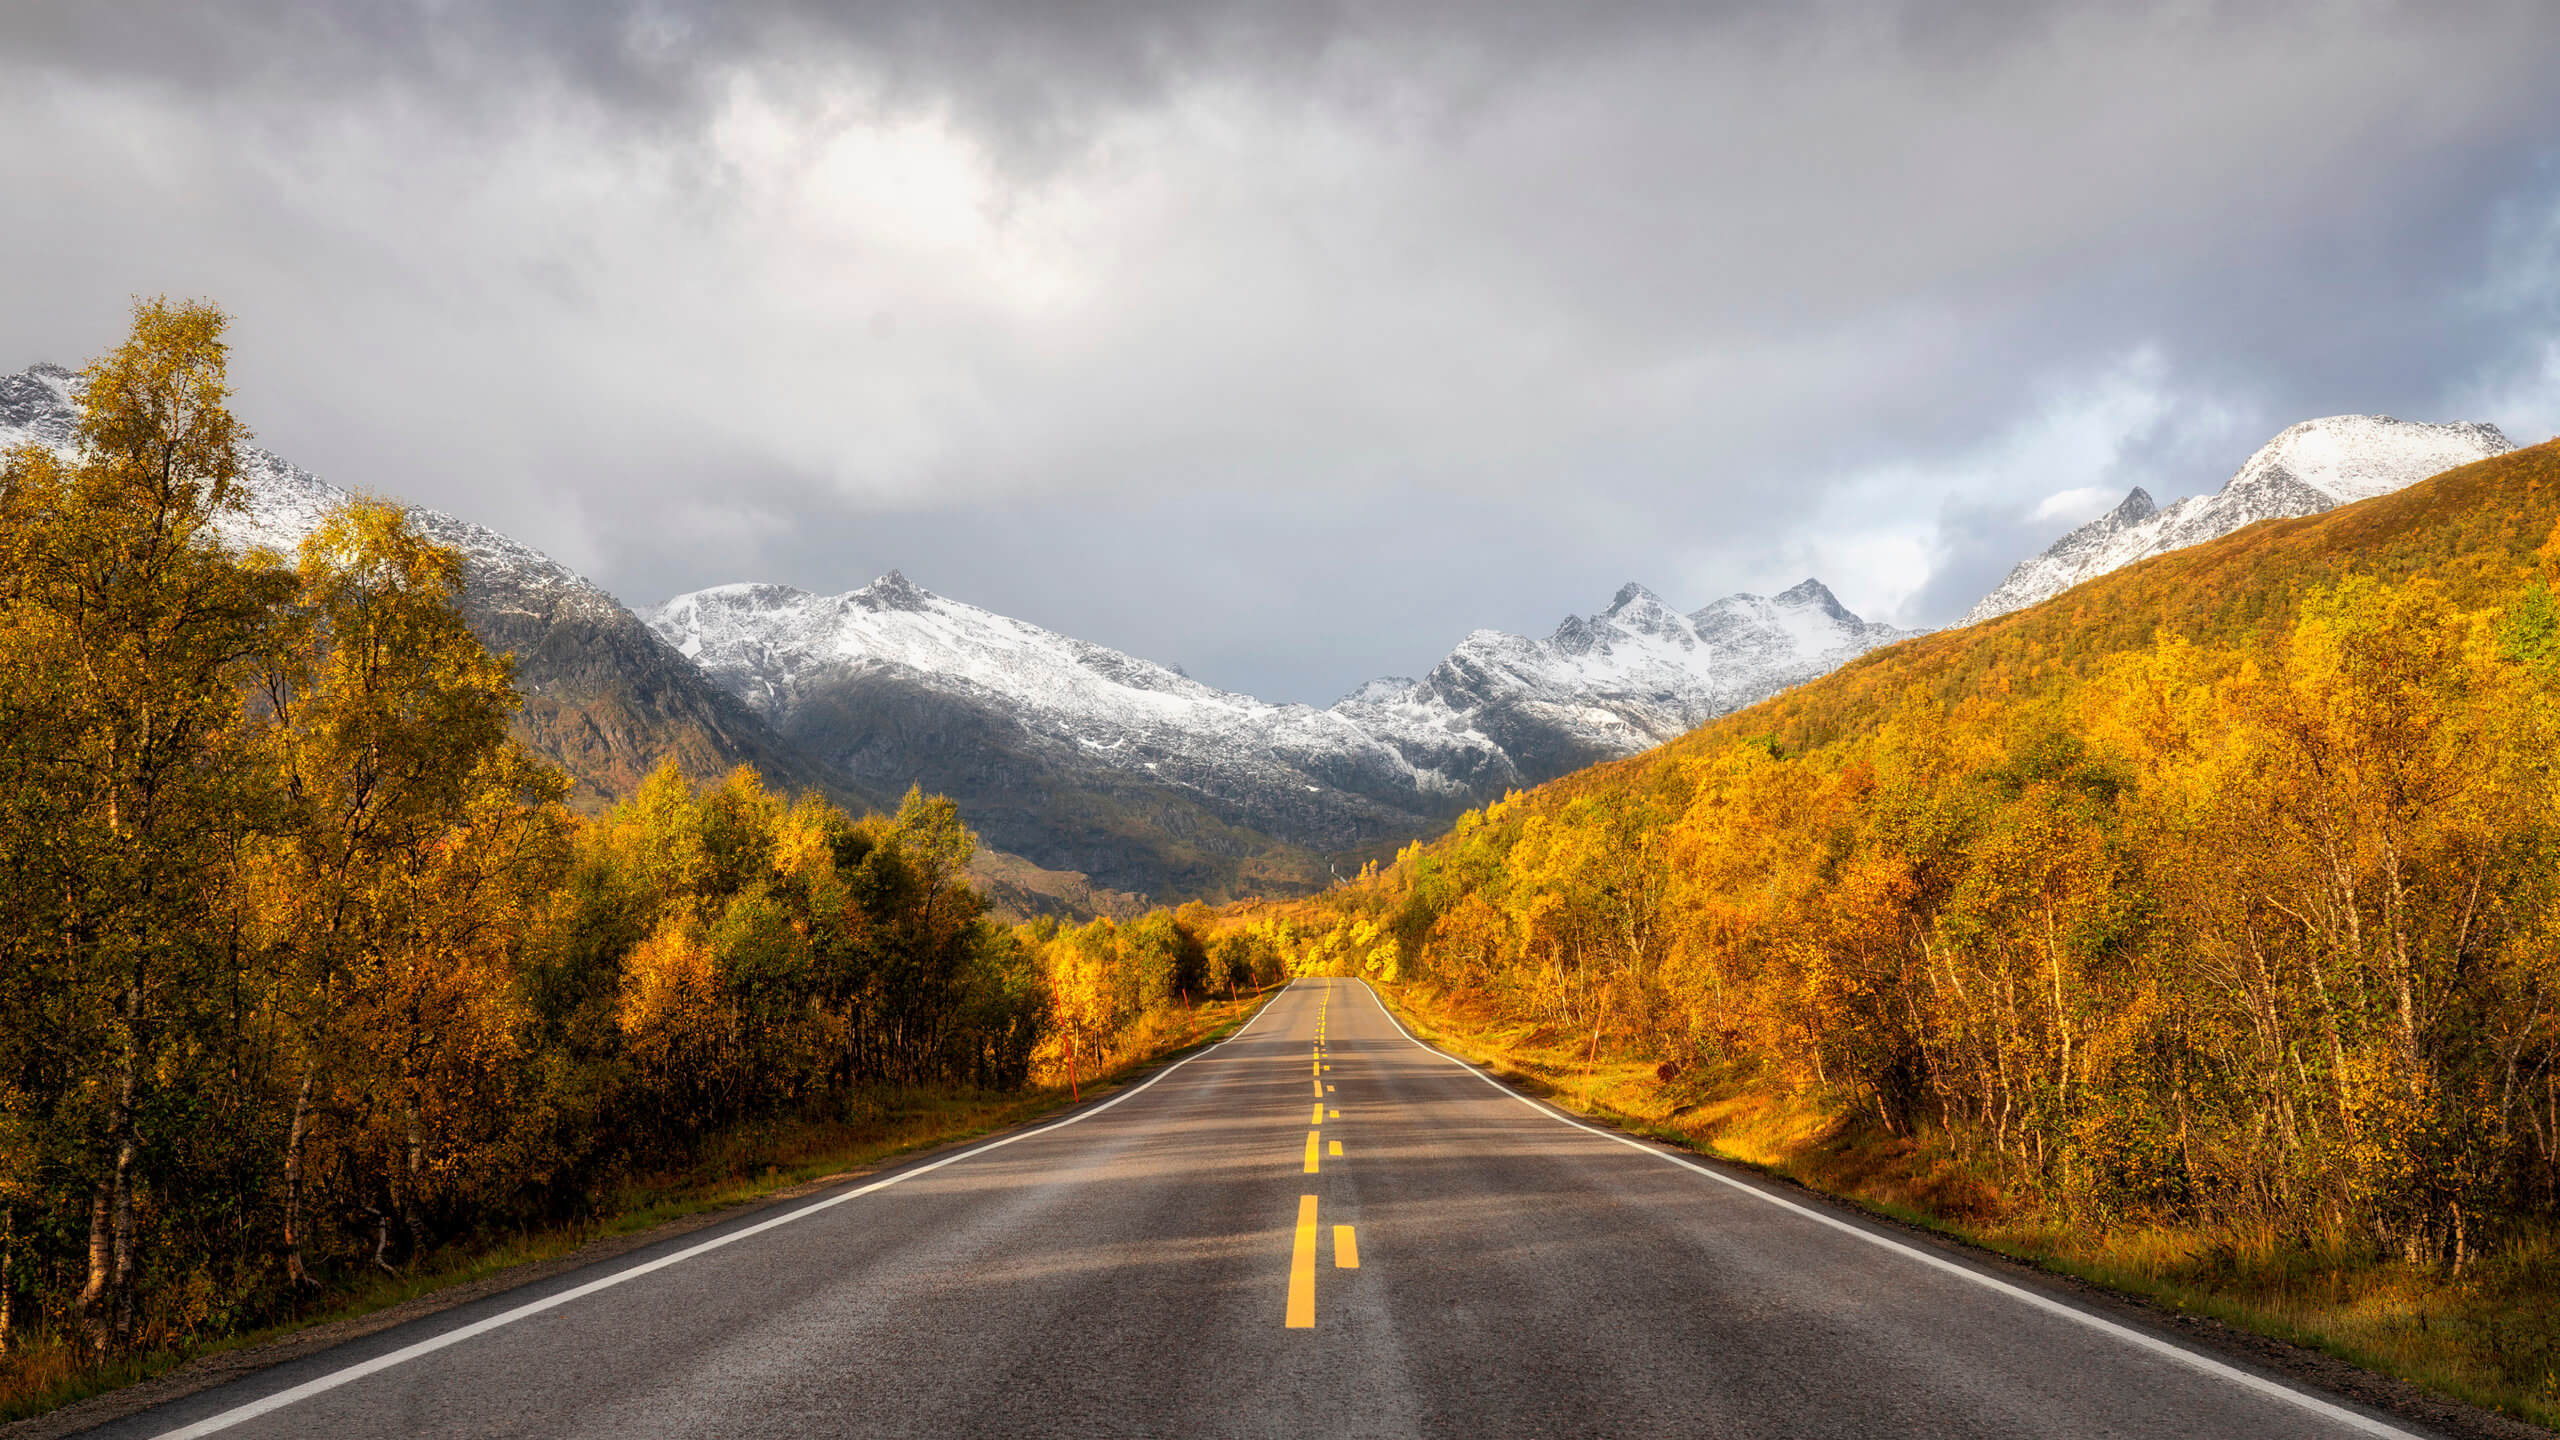 Scenic road in Norway - Photo by Joakim Jormelin